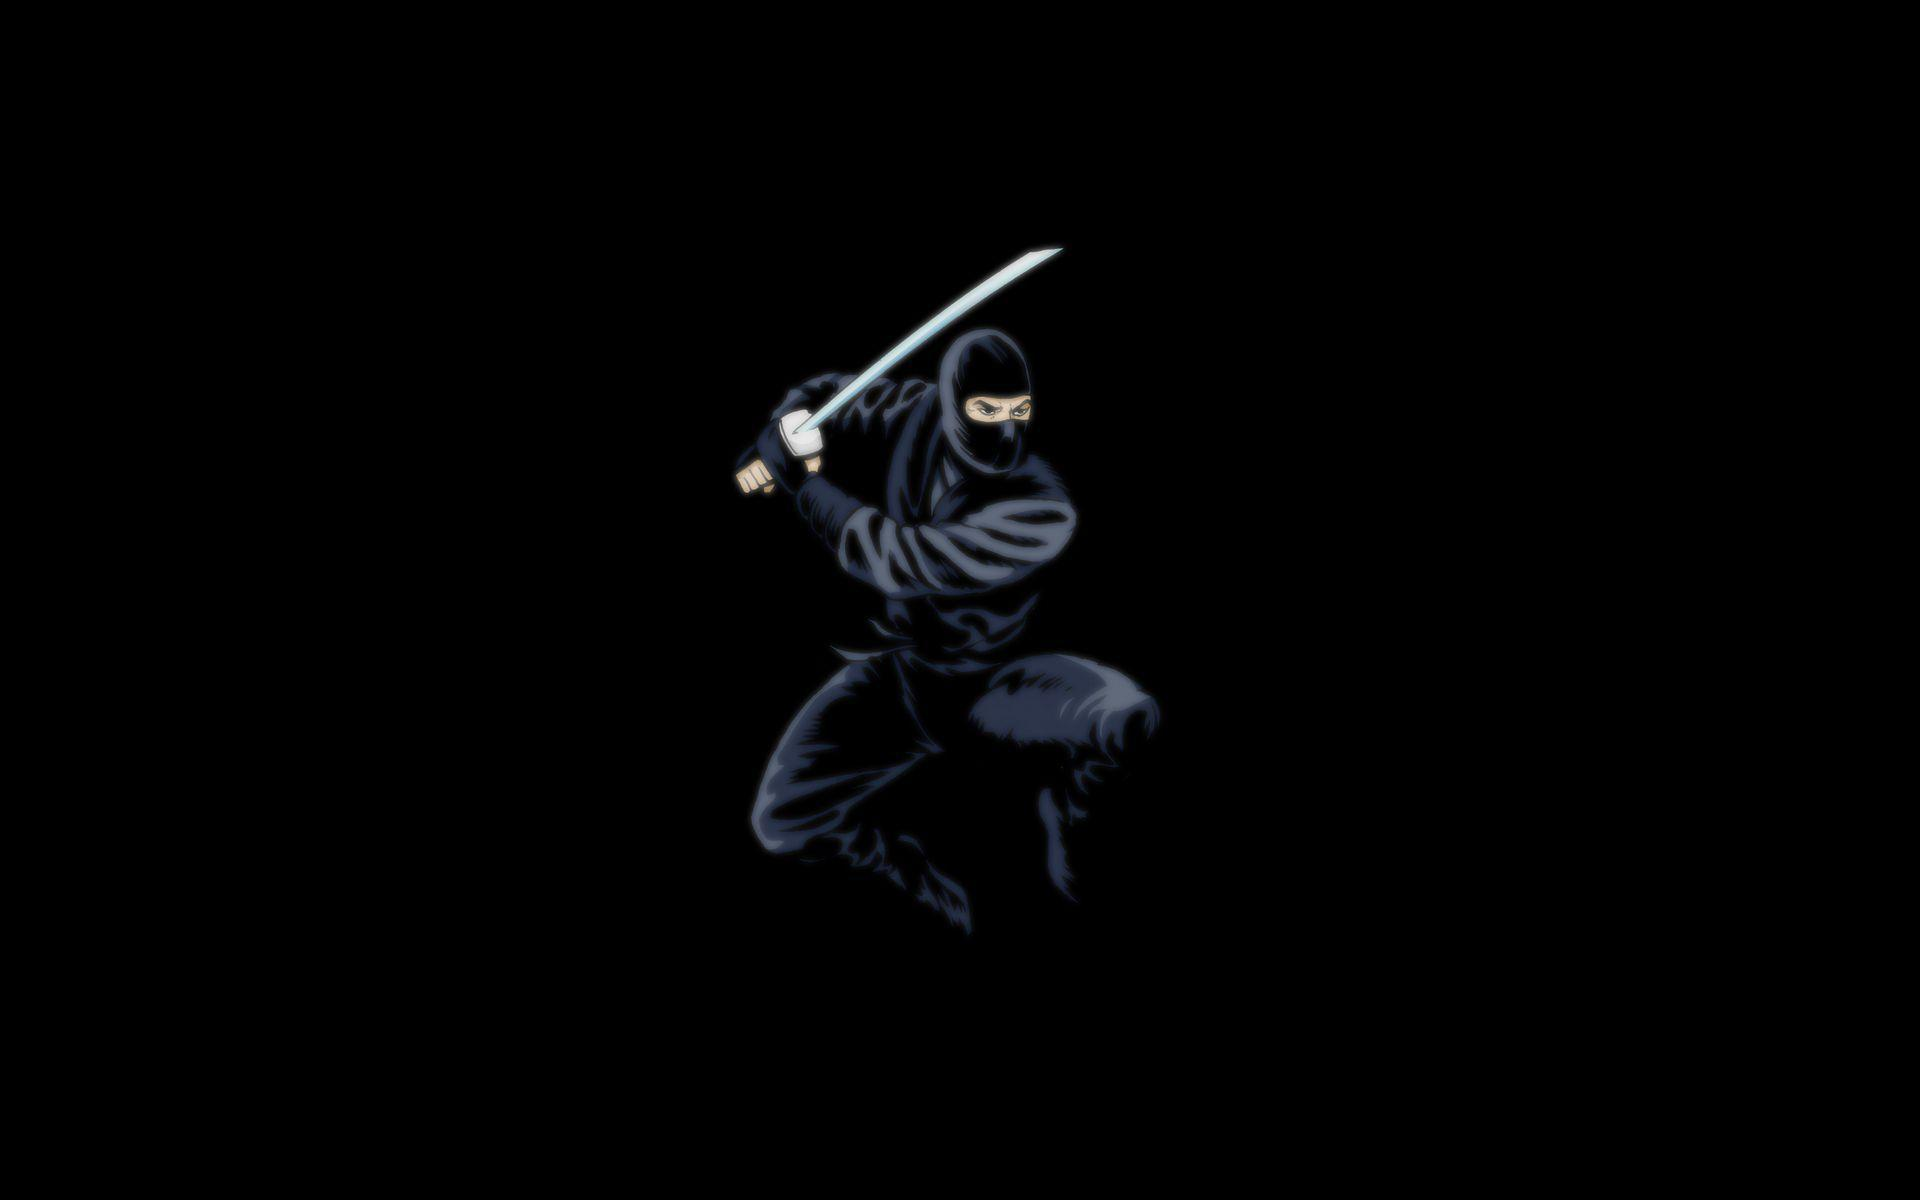 Ninja Wallpapers - Wallpaper Cave